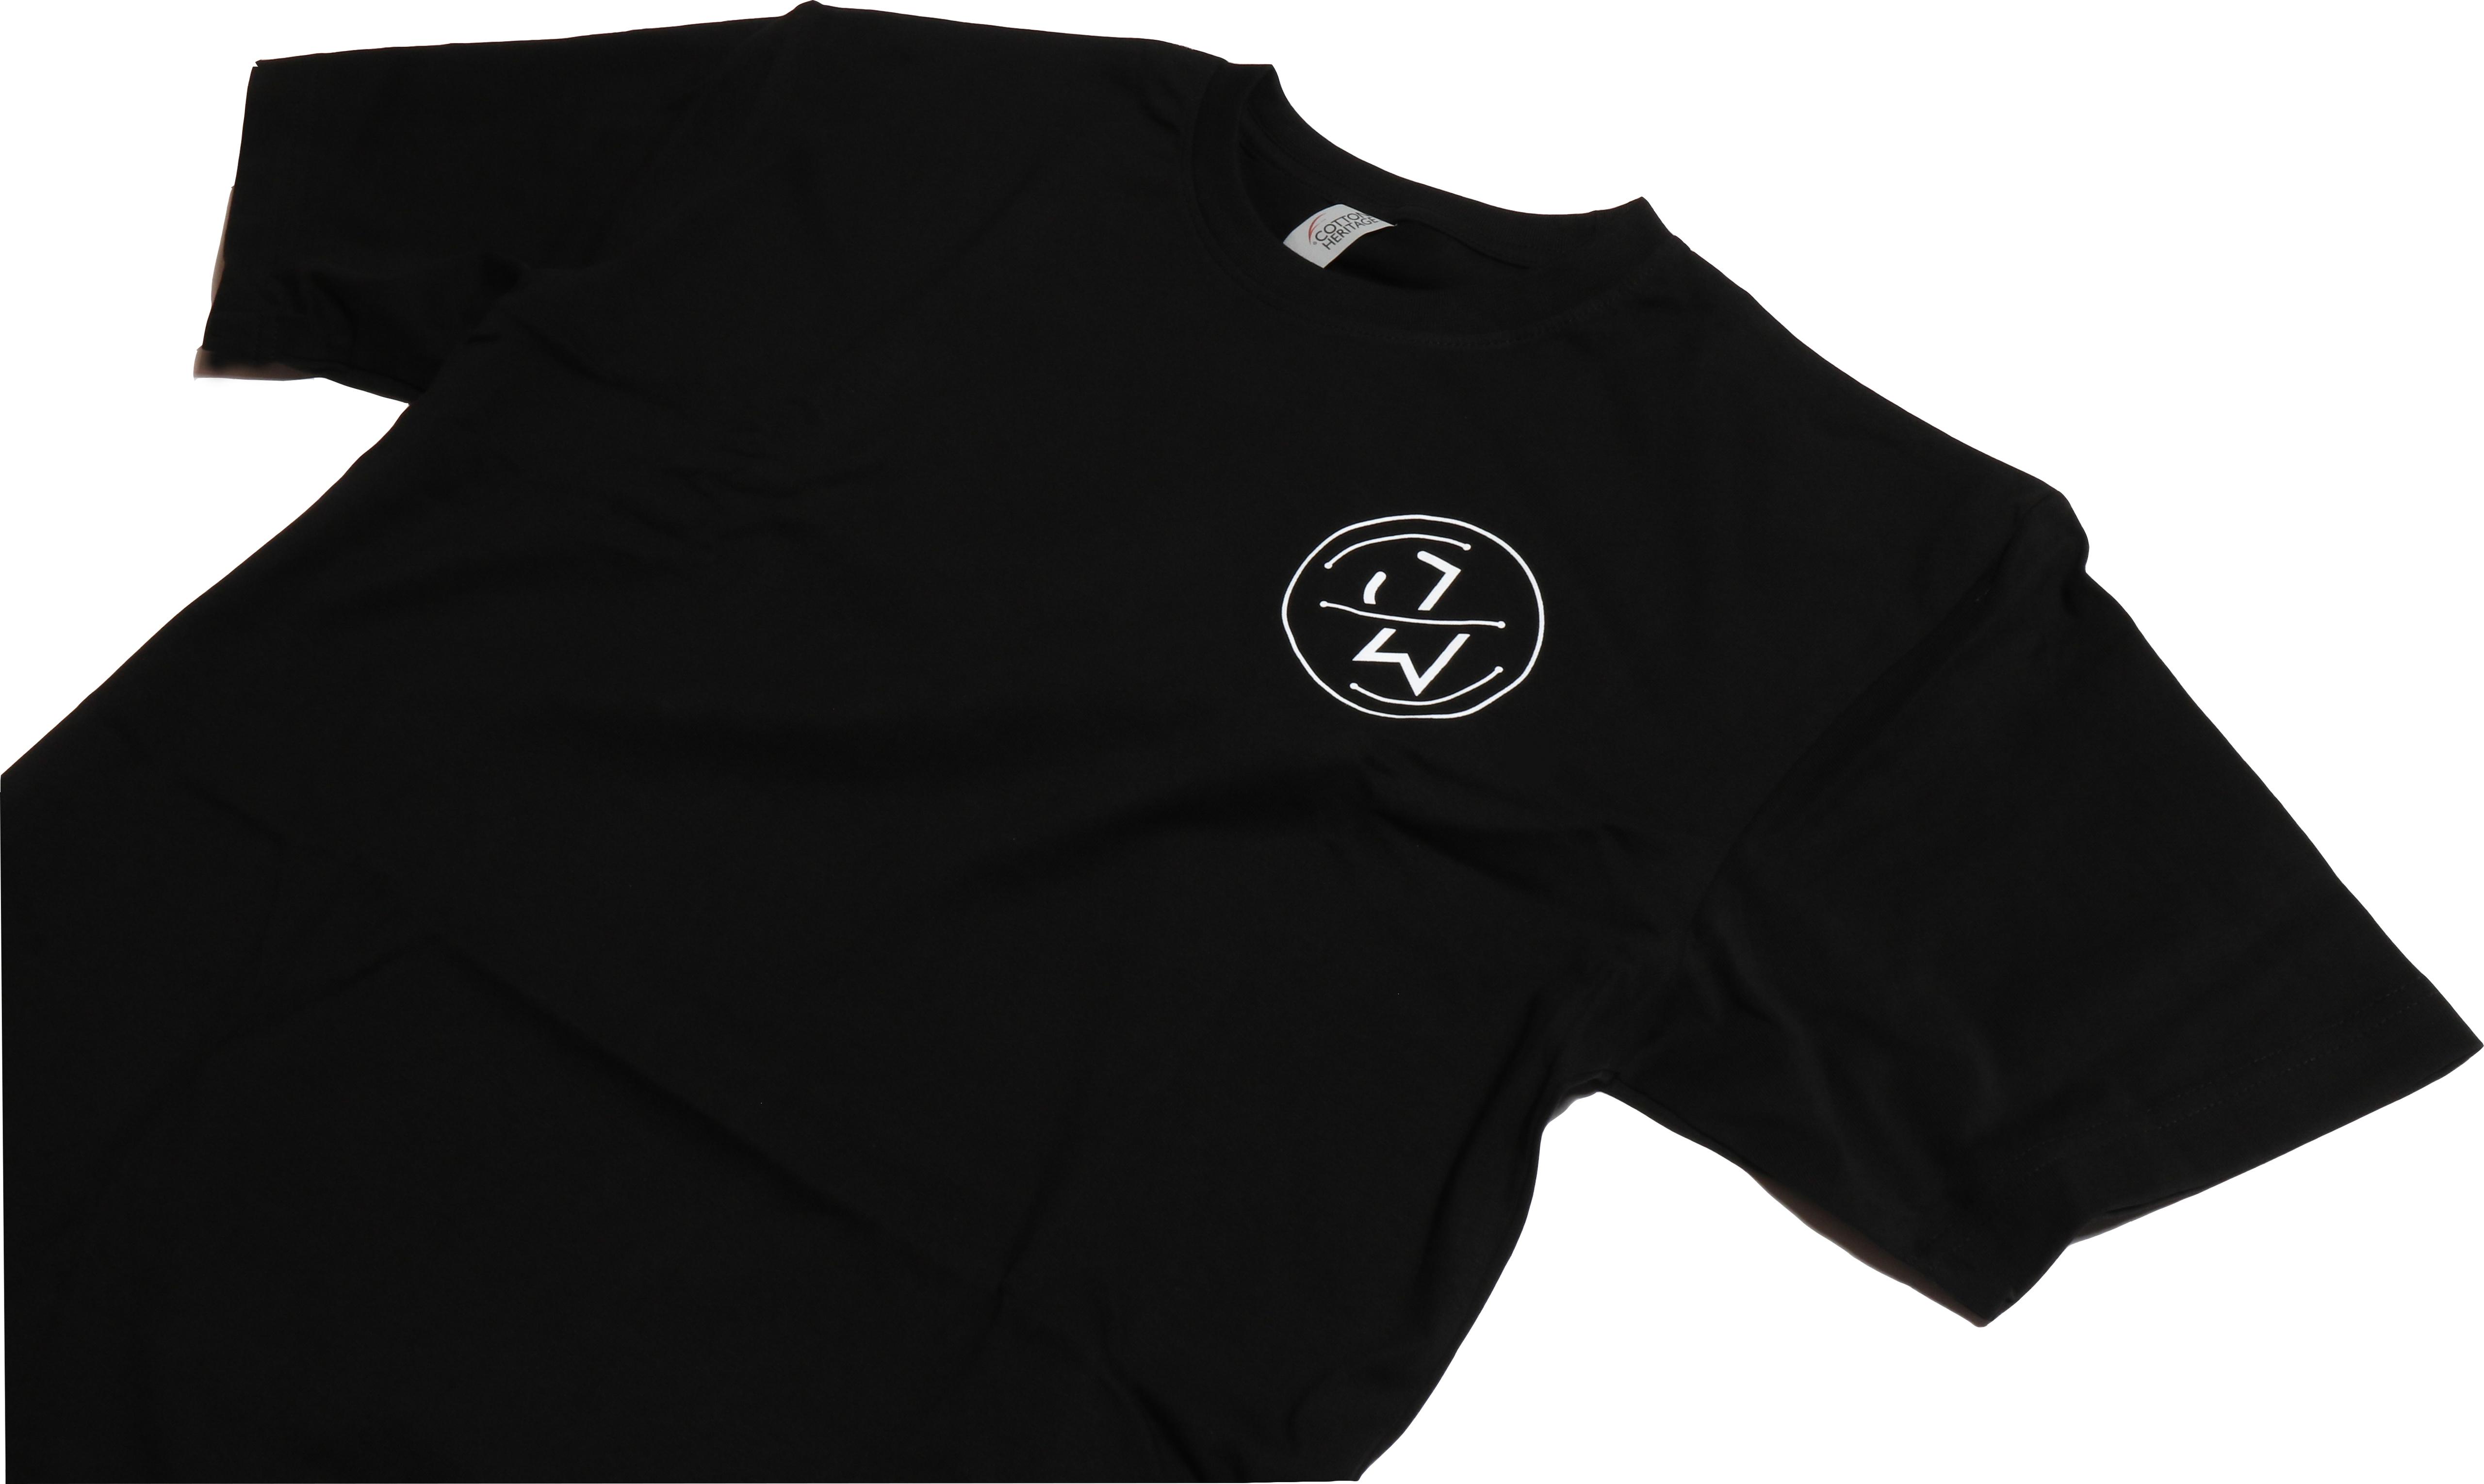 Jake Wyatt Cigar Co. T-Shirt - Black